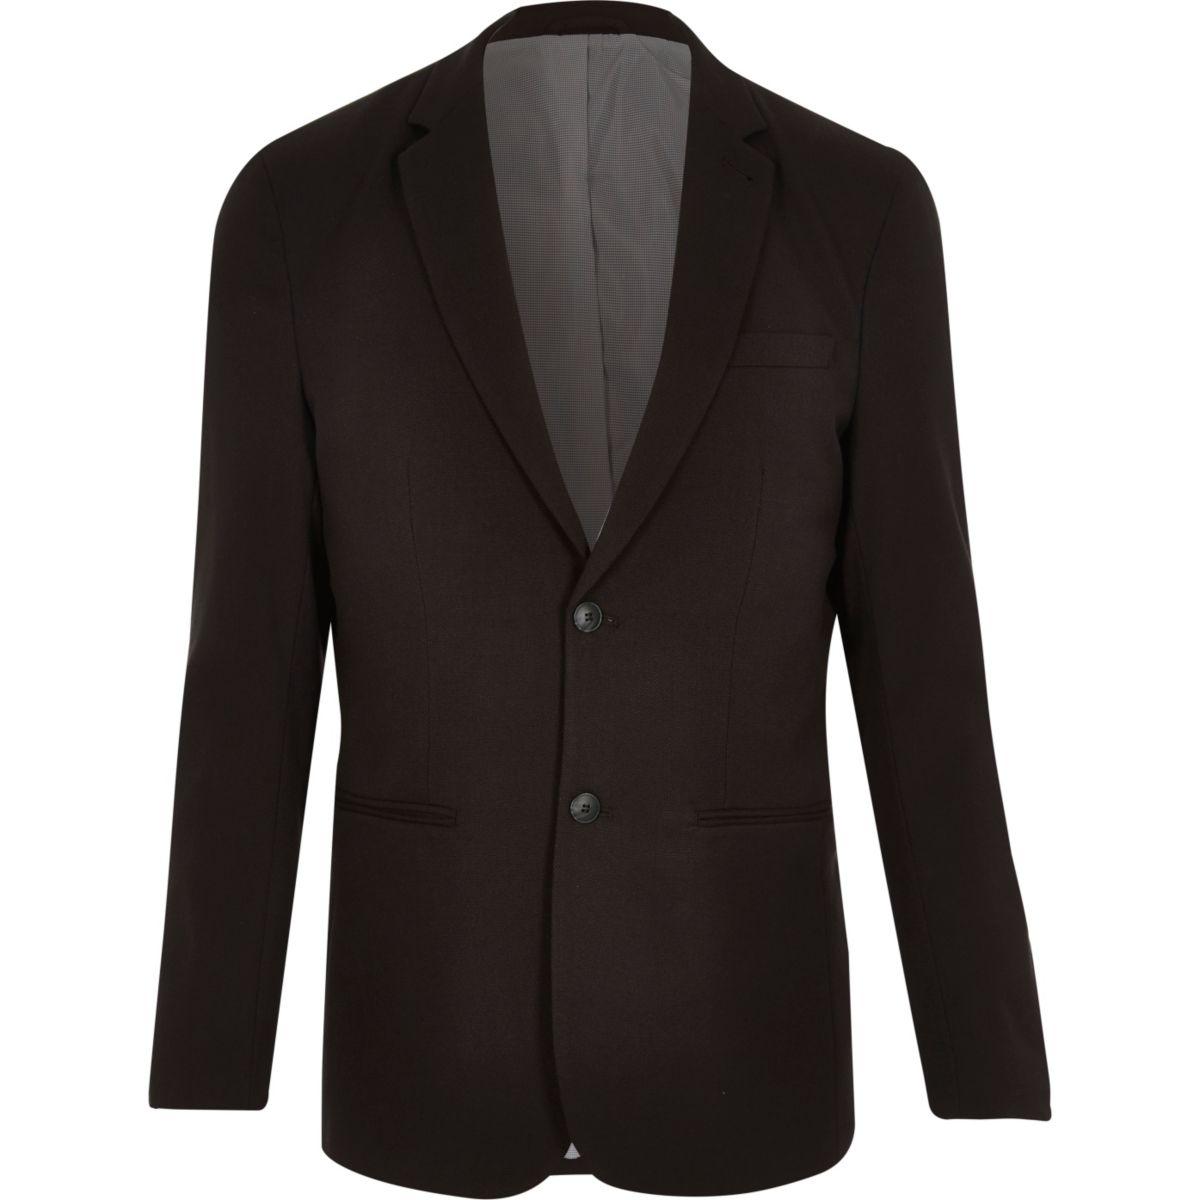 Navy Jack & Jones Premium blazer